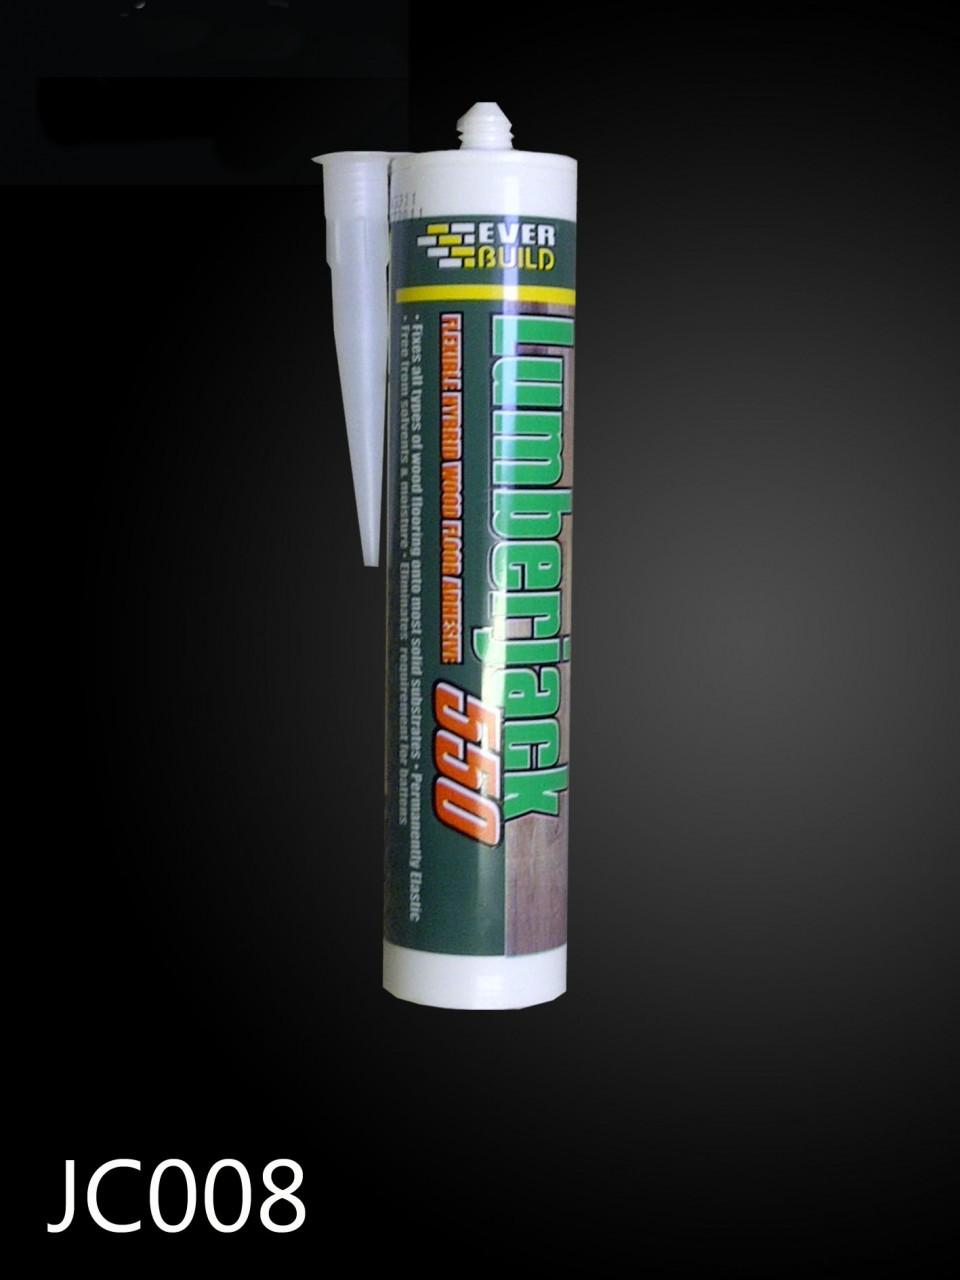 Stair Cladding Polymer Adhesive Polymer Adhesive